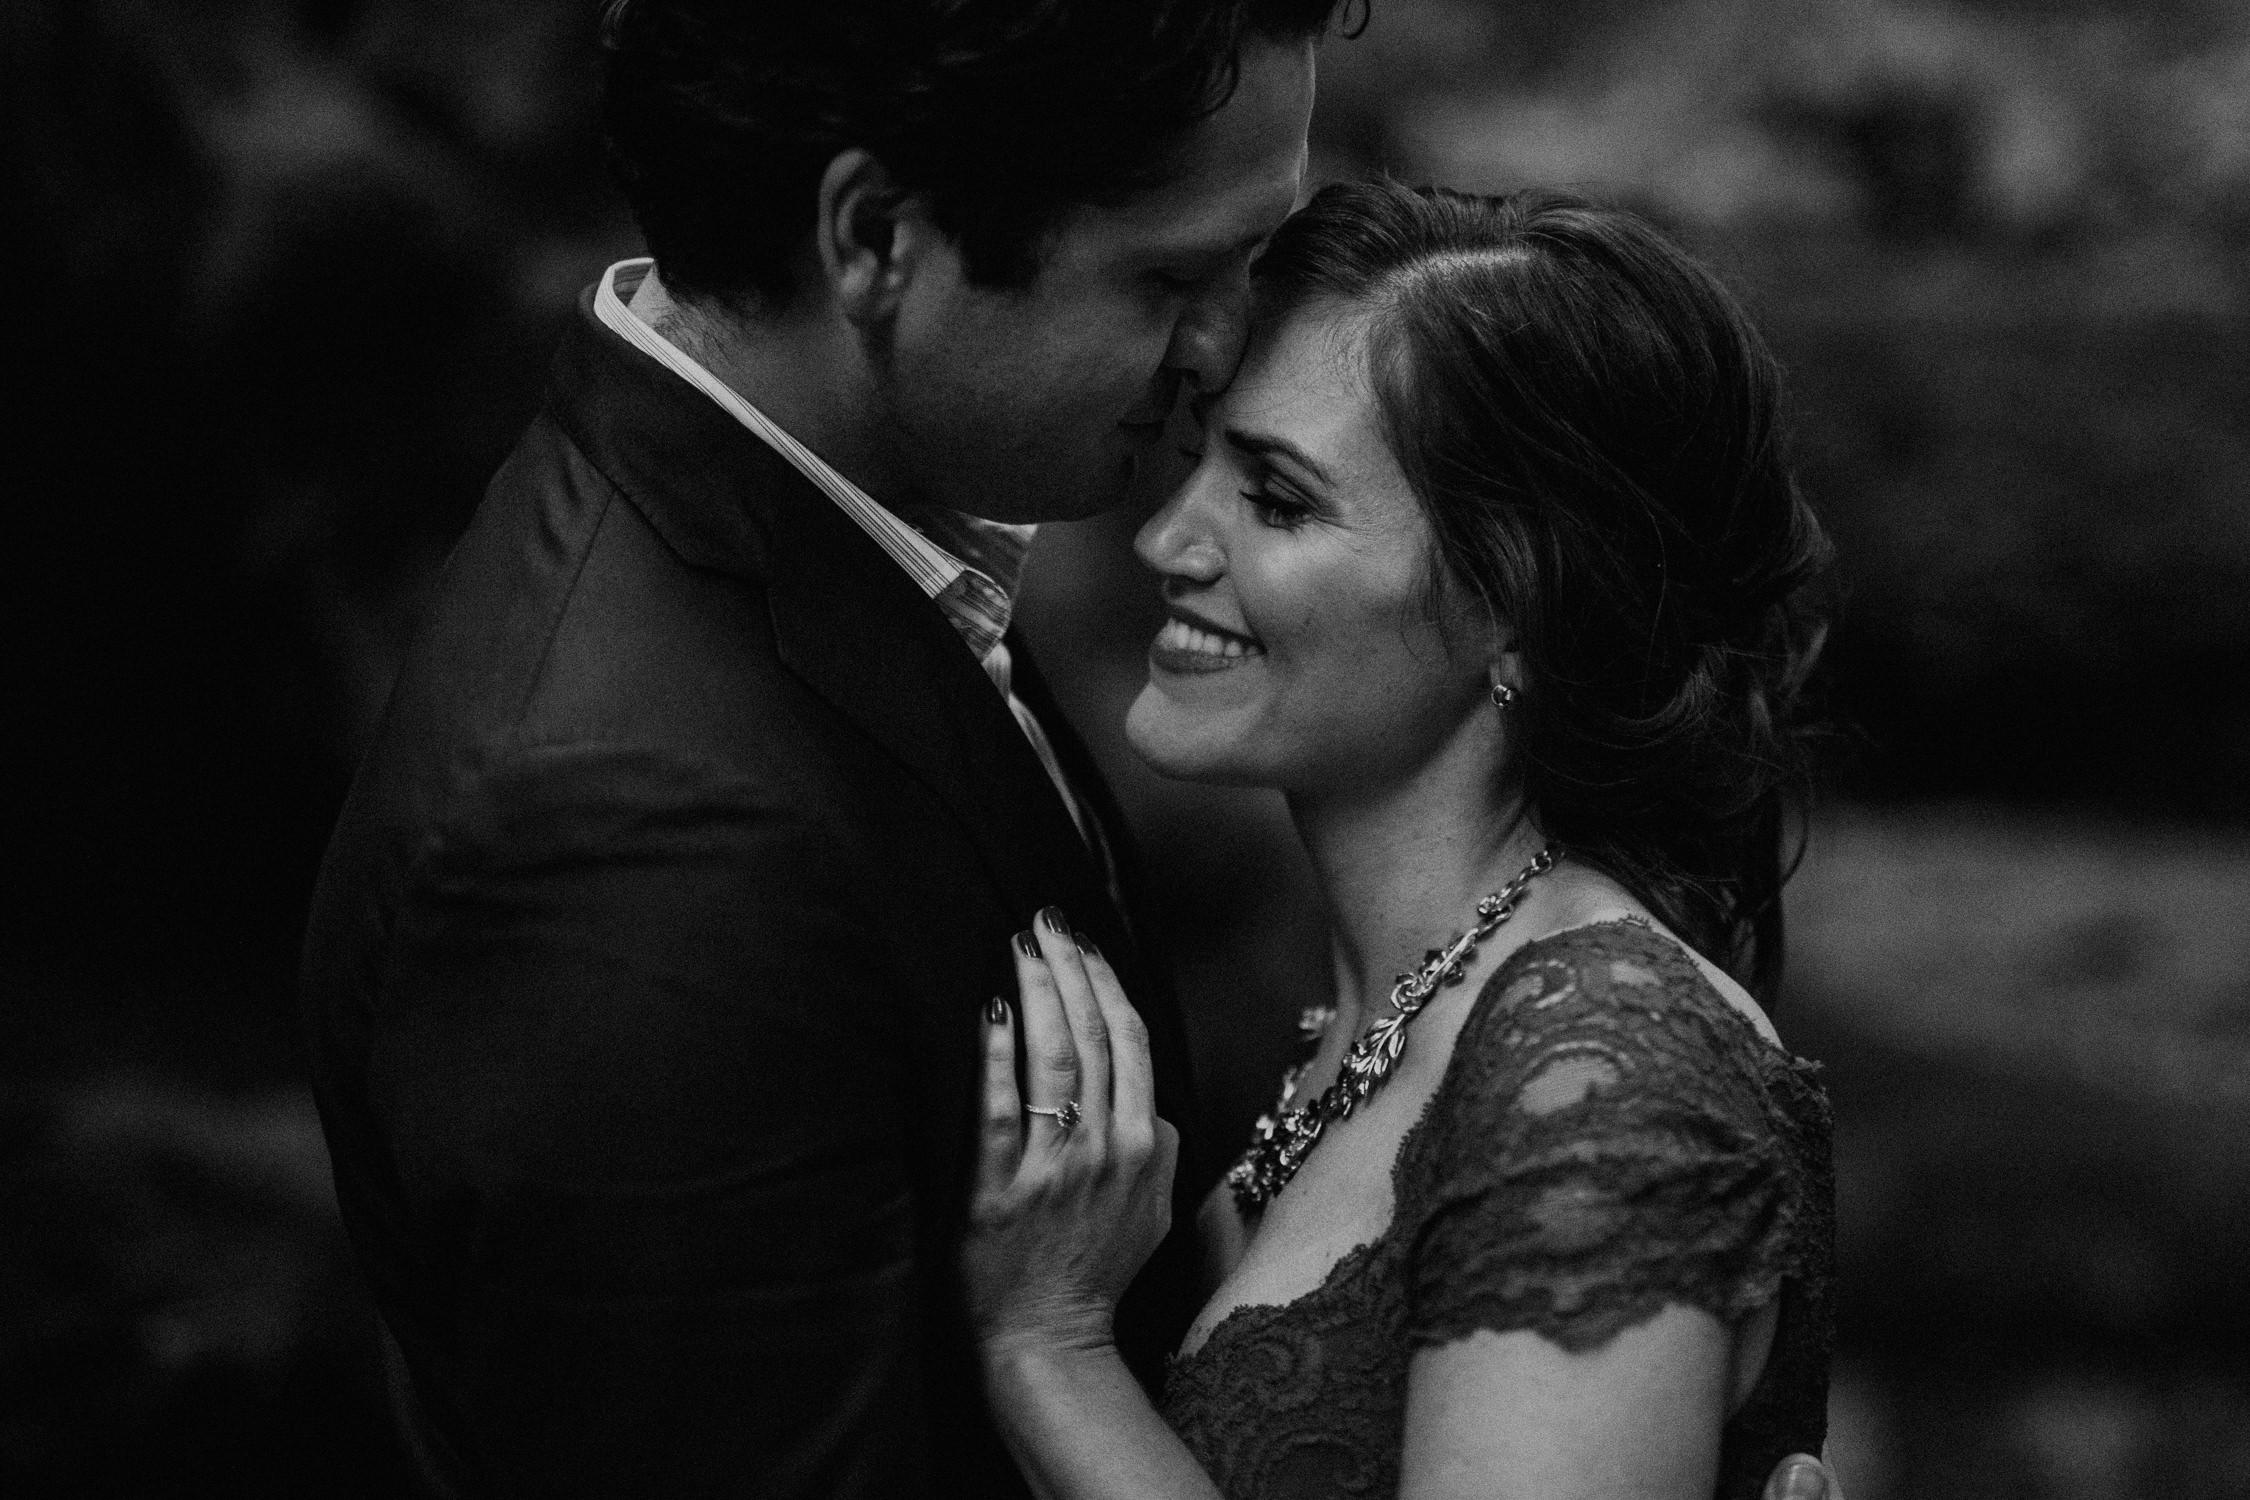 couple-intimate-engagement-session-mt-tam-43.jpg